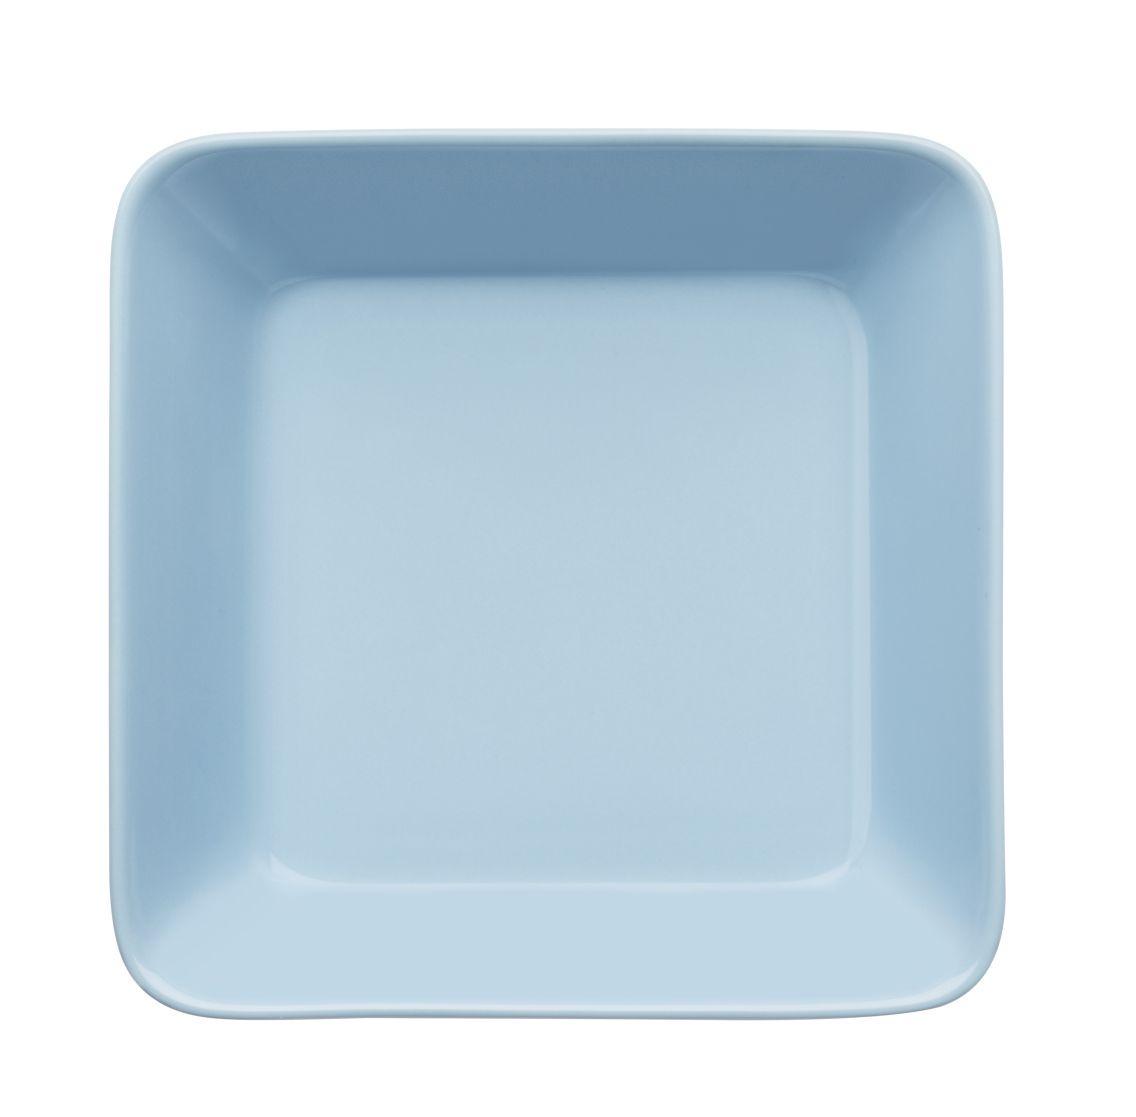 Teema_plate_16x16cm_light_blue_6411923657846.jpg